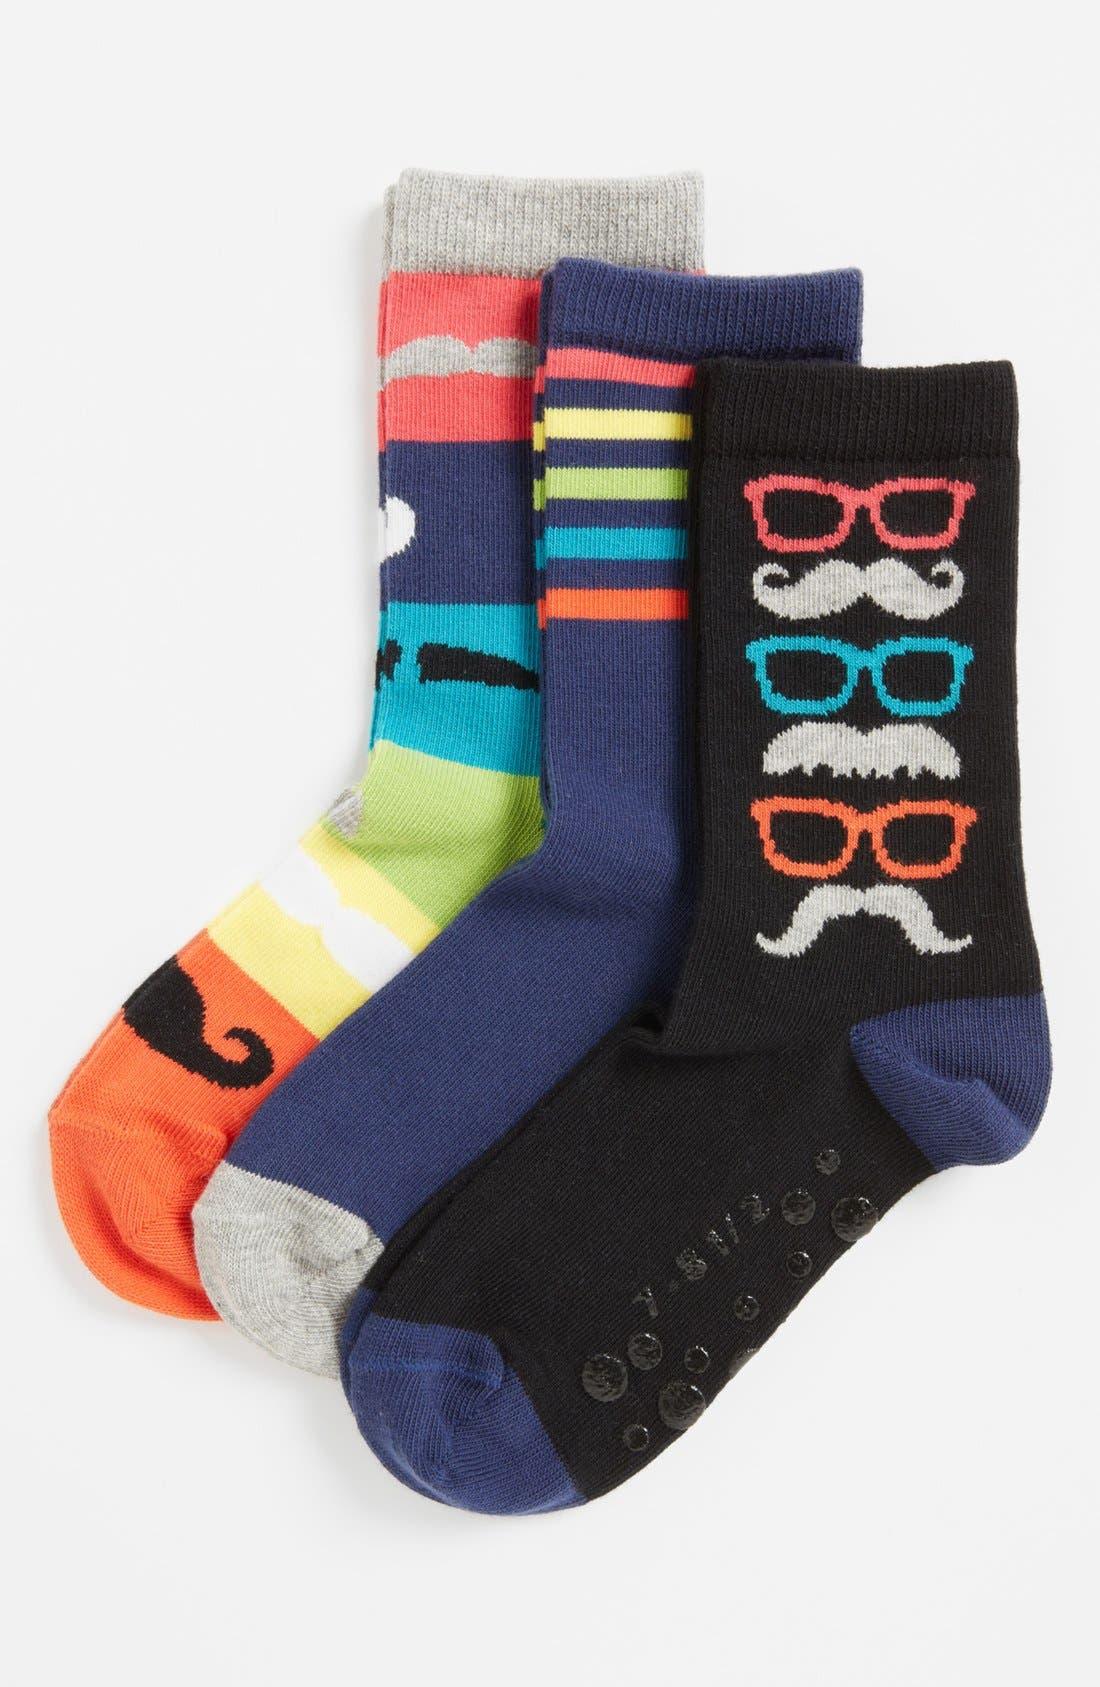 Main Image - Nordstrom 'Mustache Party' Socks (3-Pack) (Kids)